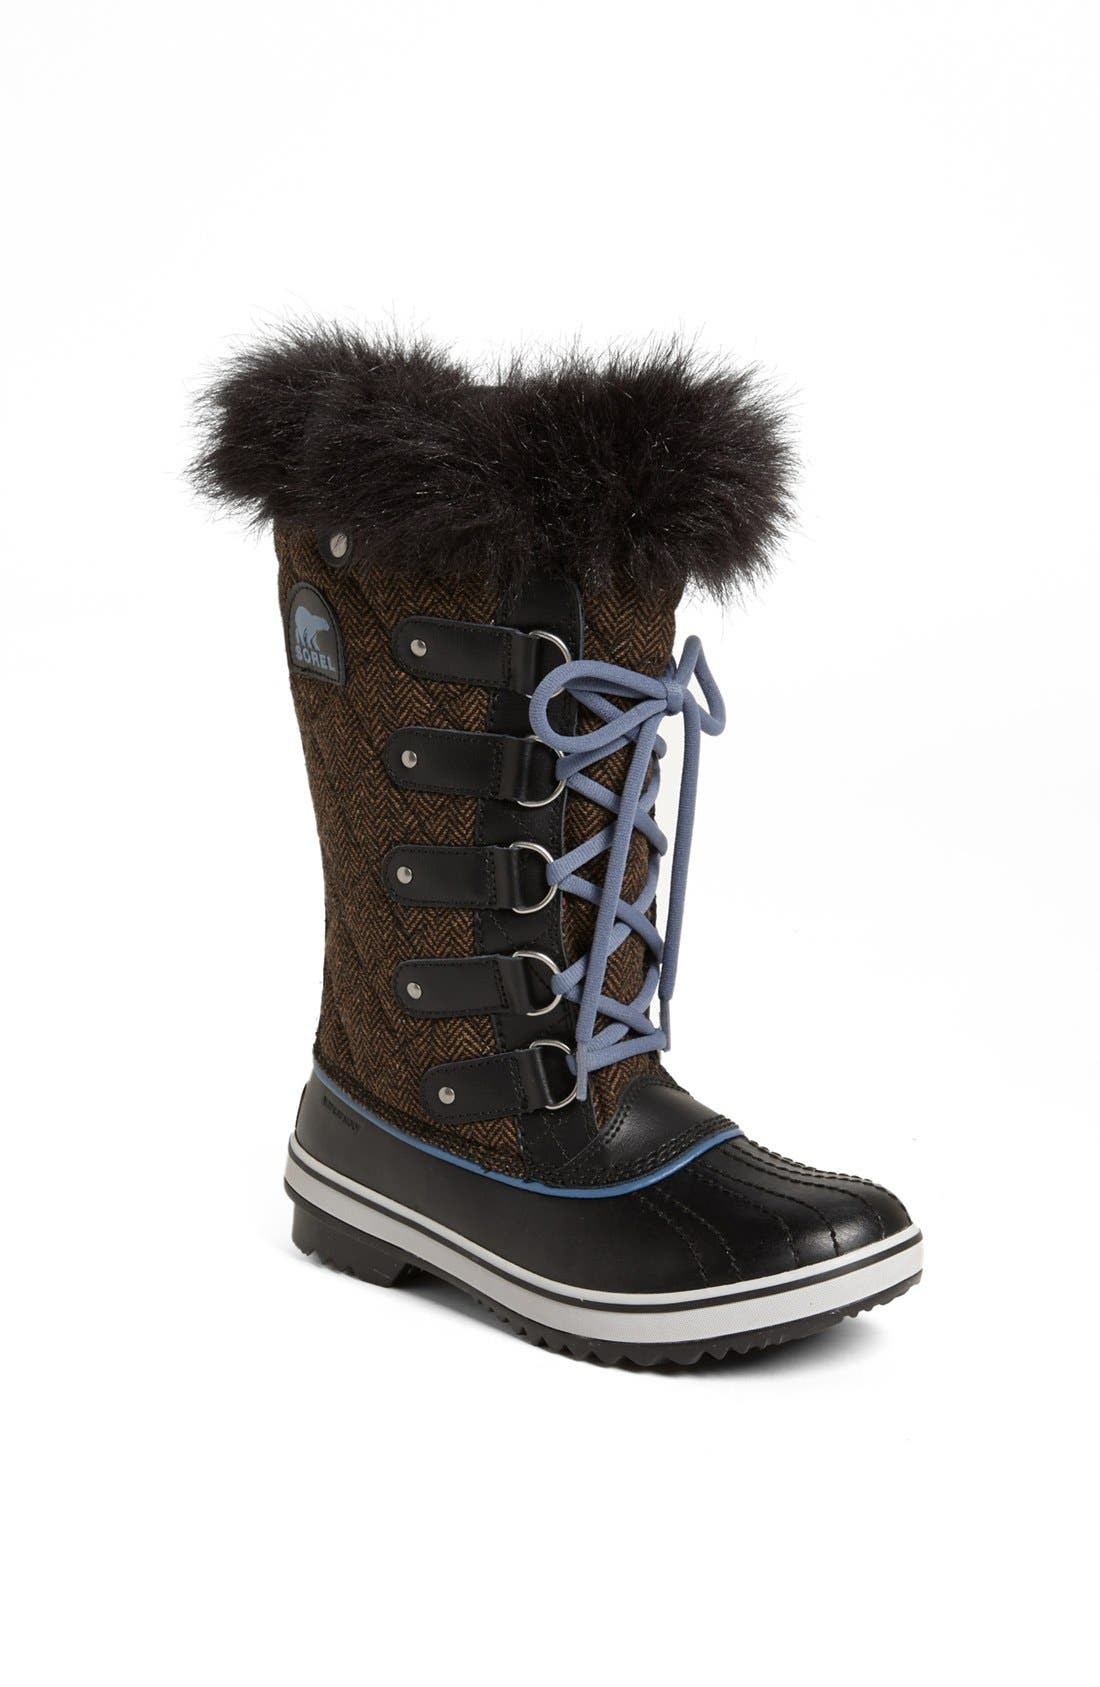 Main Image - SOREL 'Tofino' Waterproof Boot